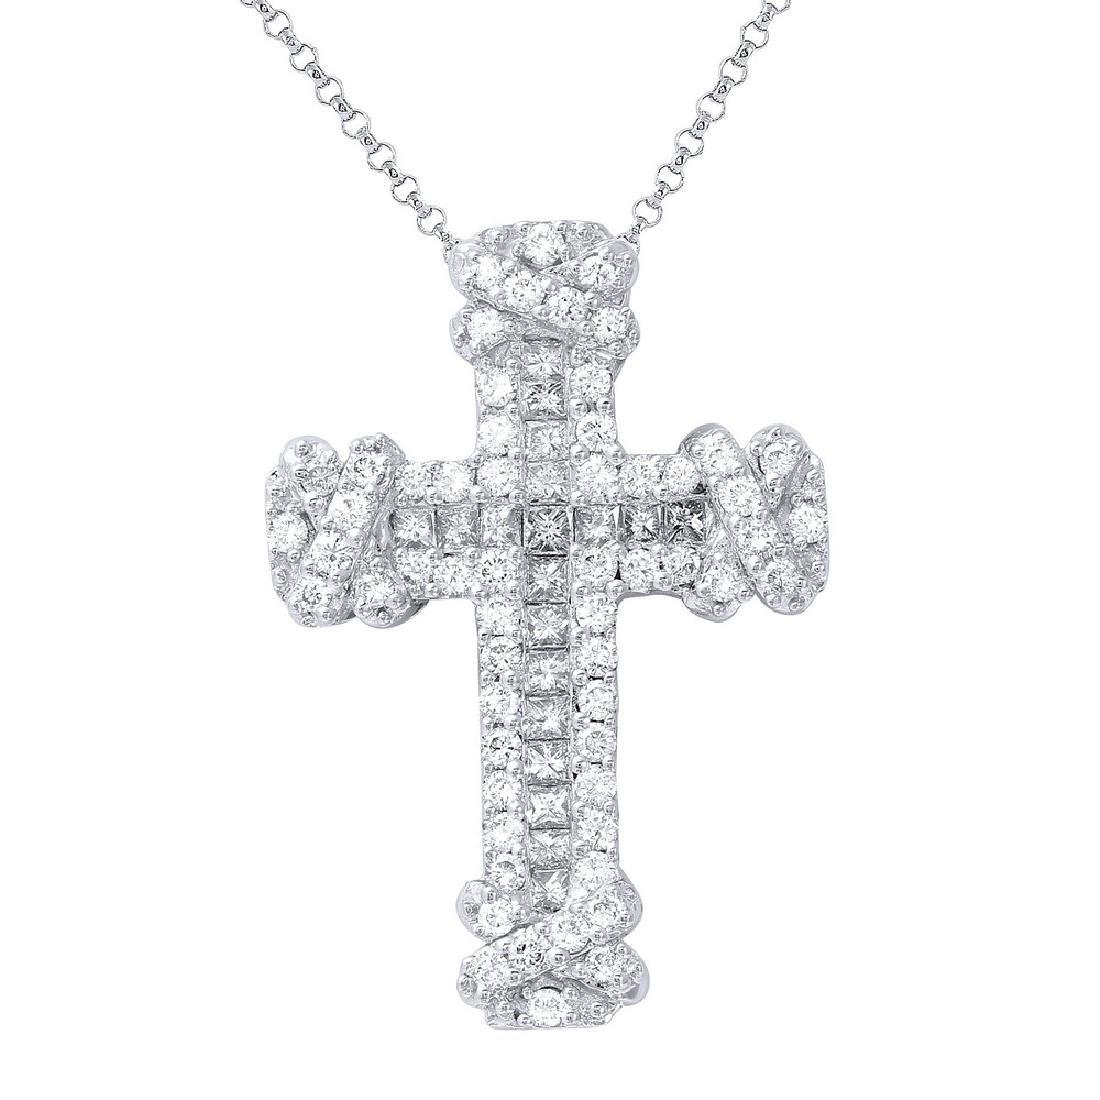 Genuine 1.21 TCW 18K White Gold Ladies Necklace